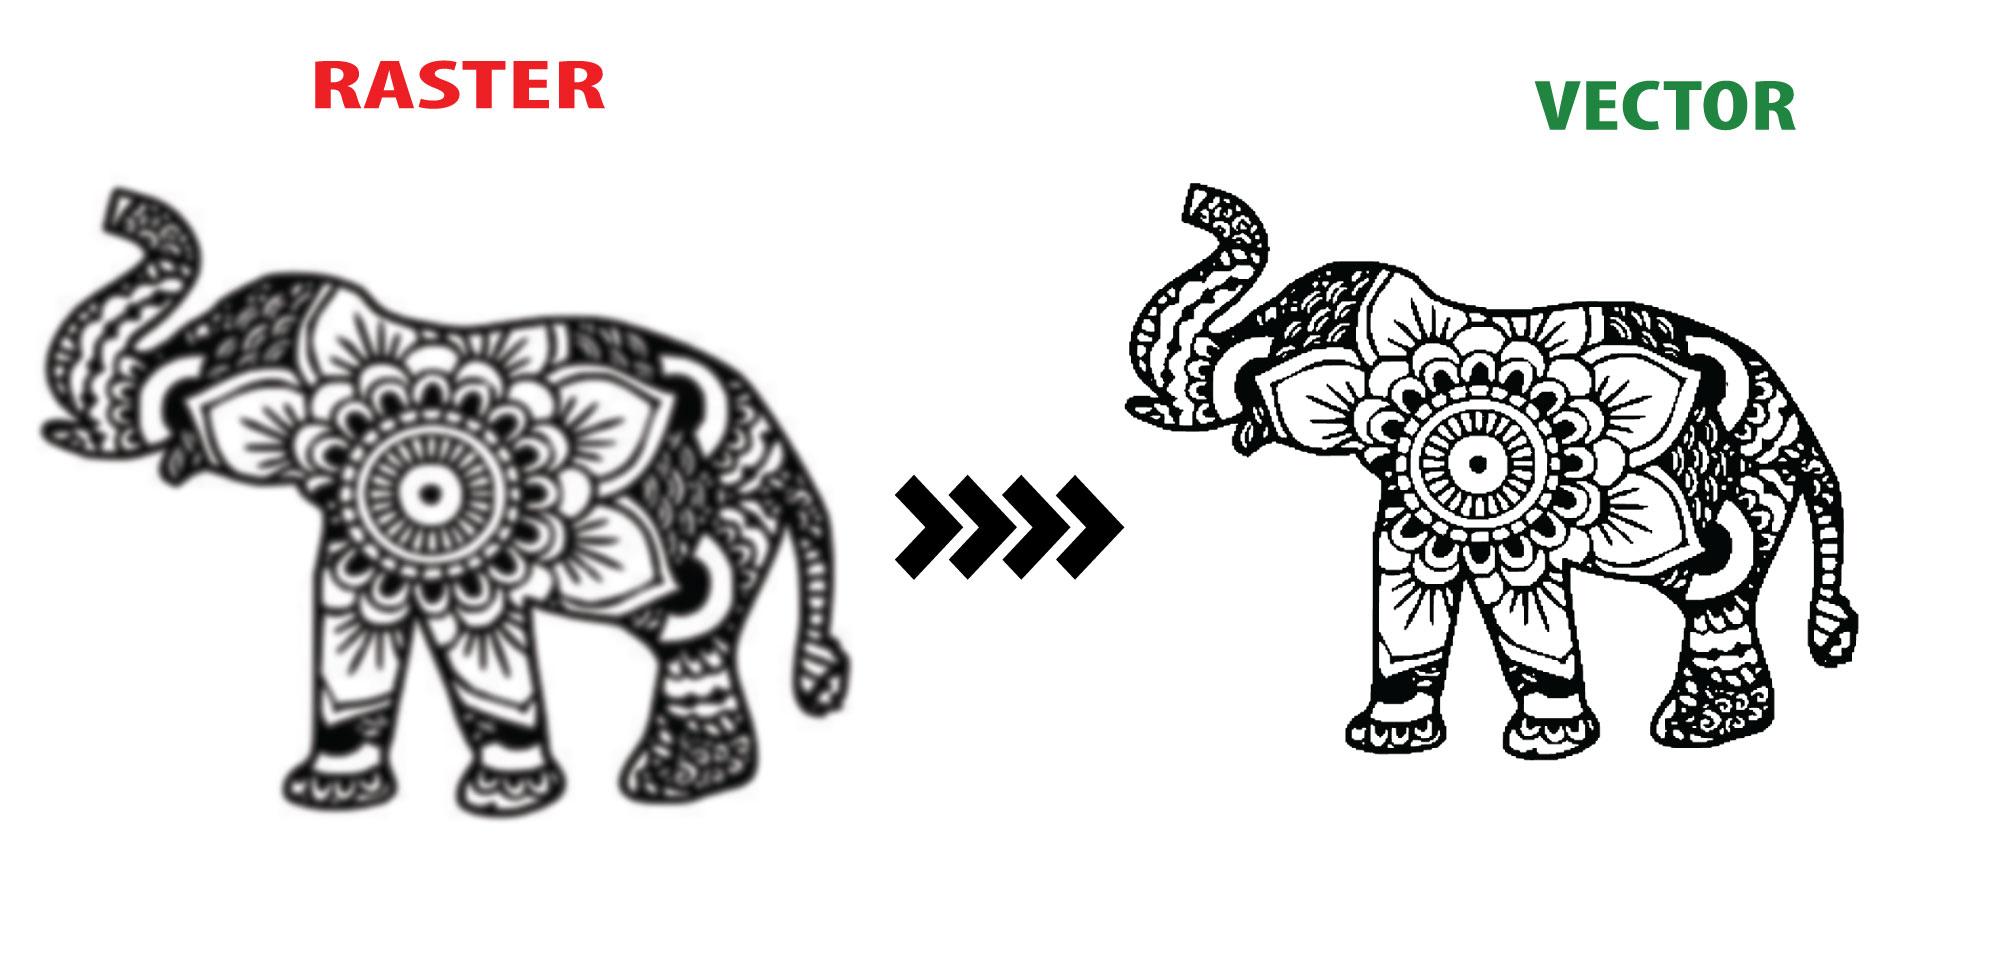 I can trace logo or image using illustrator